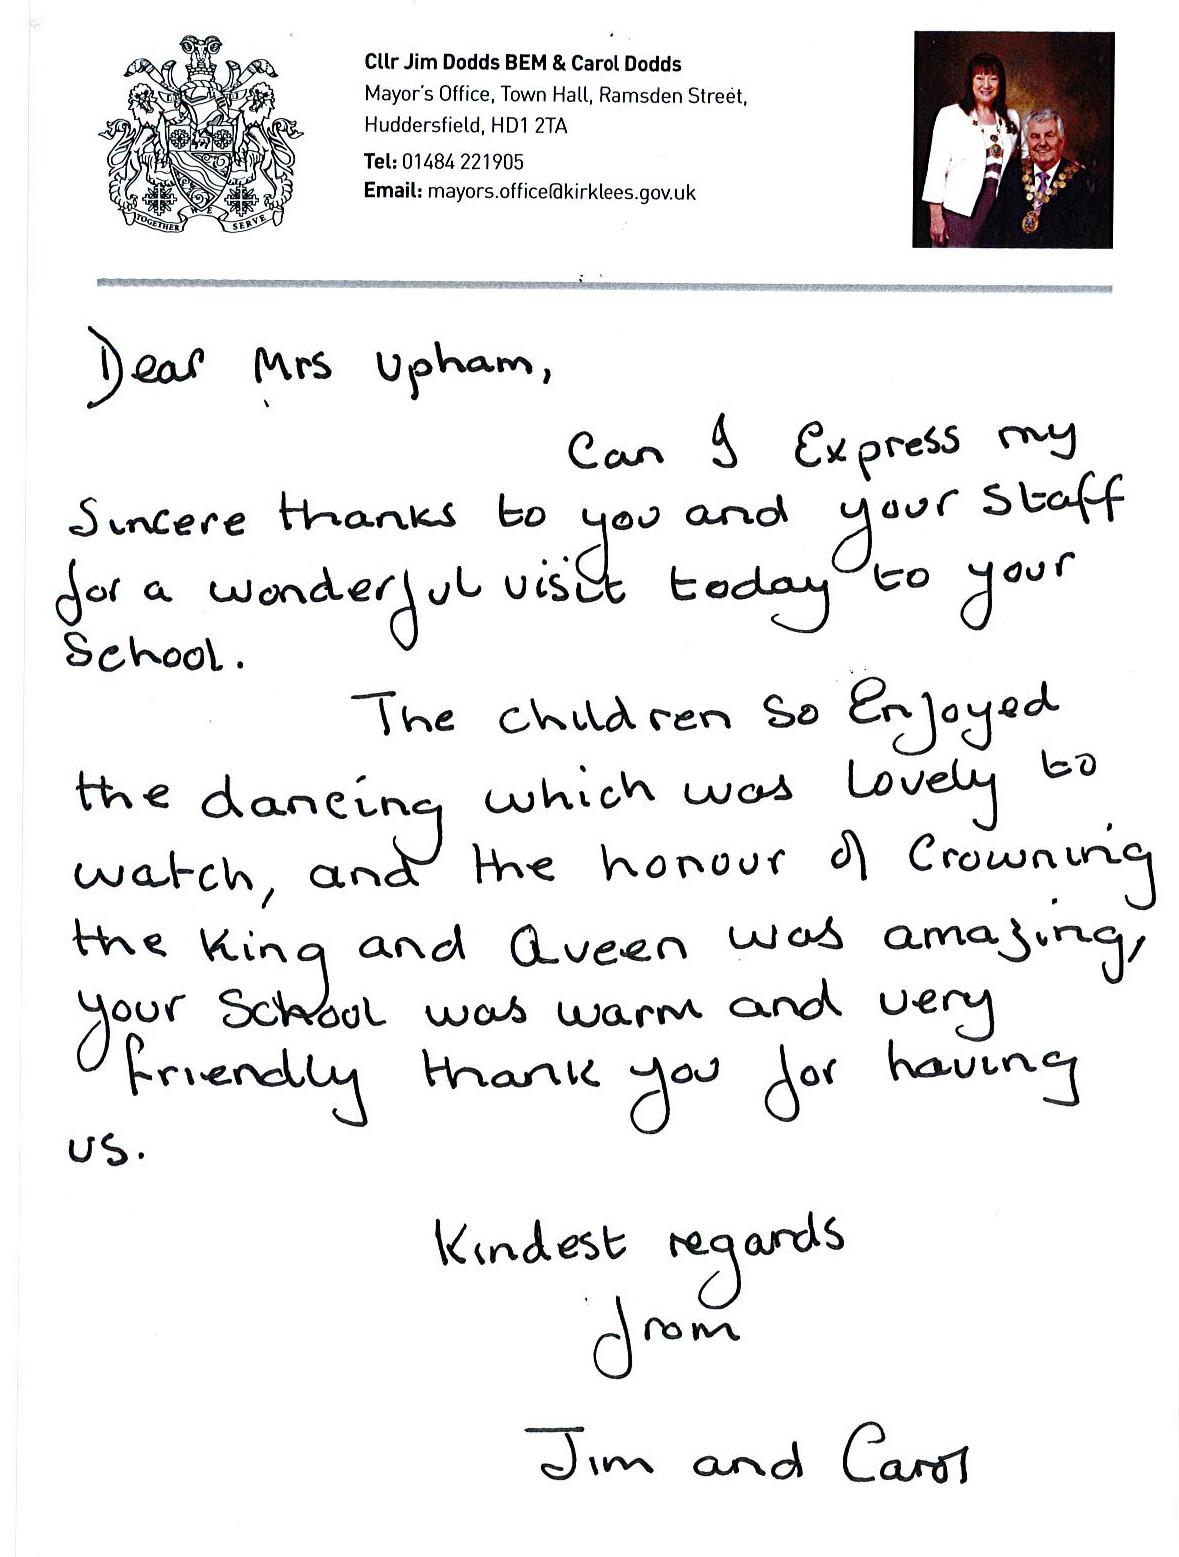 Letter of thanks from the Mayor of Kirklees